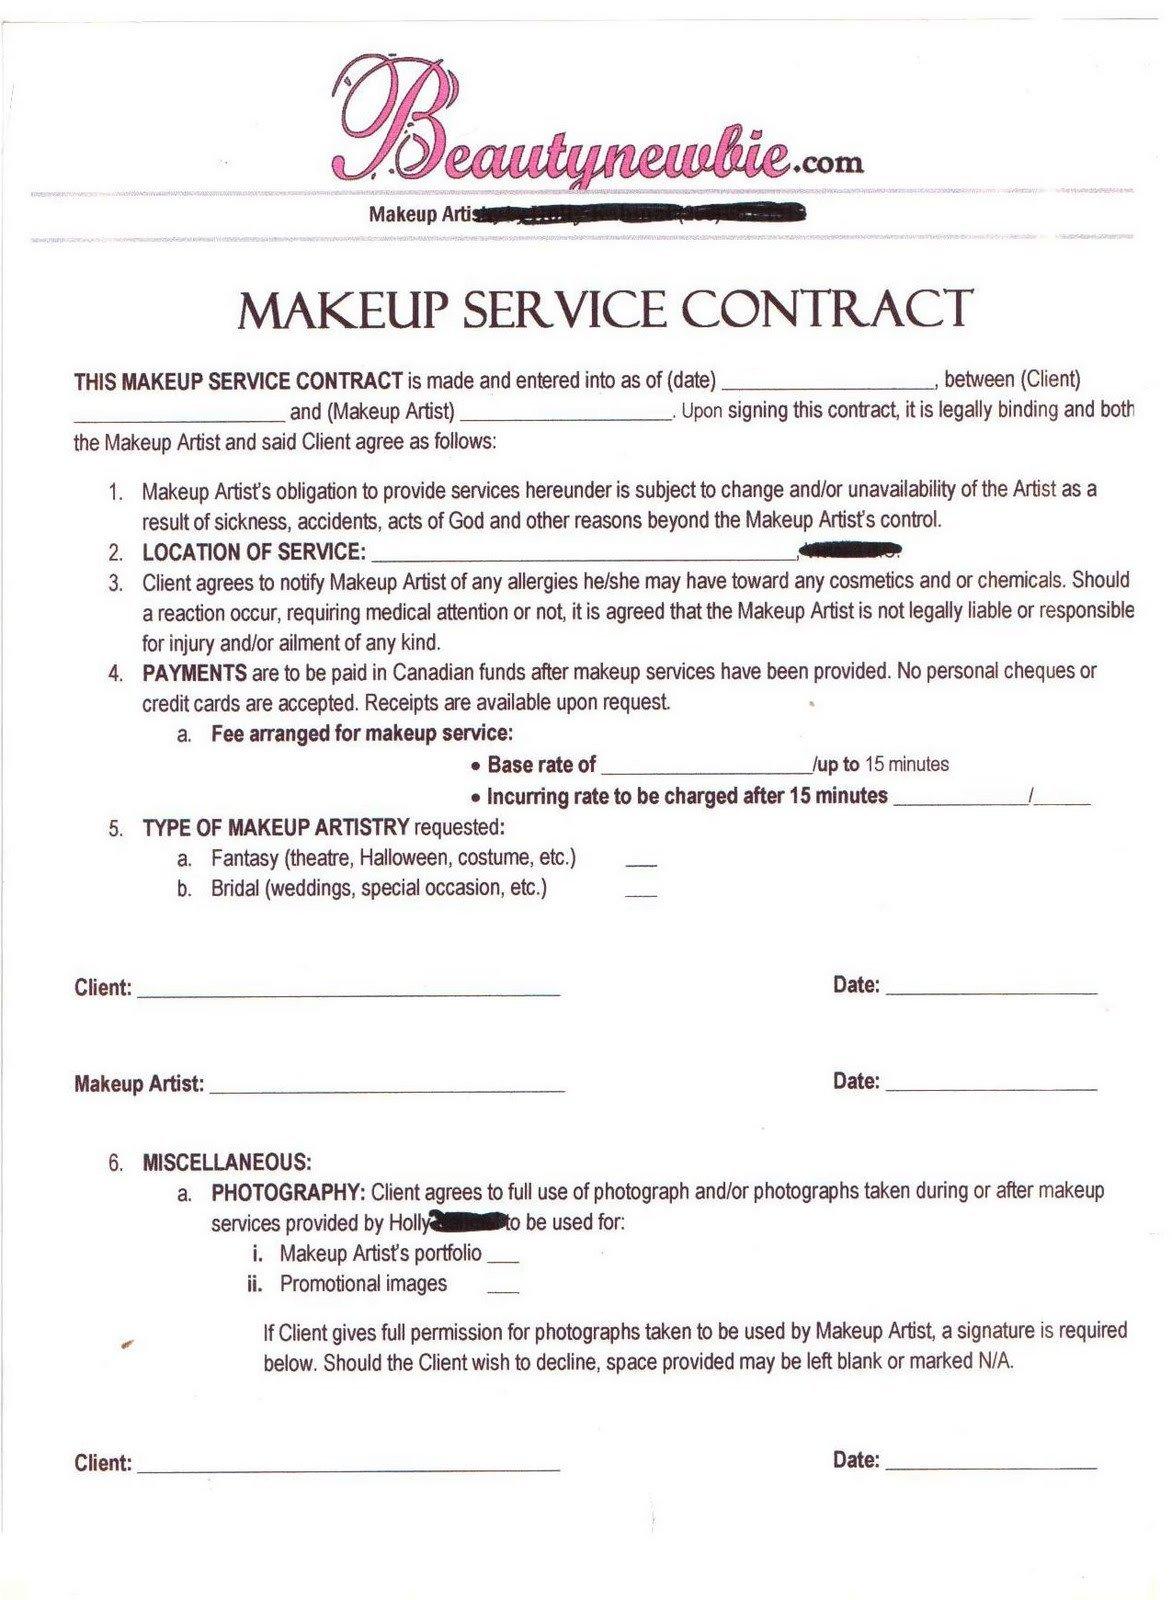 Freelance Makeup Artist Contract Template Freelance Makeup Artist Contract Template